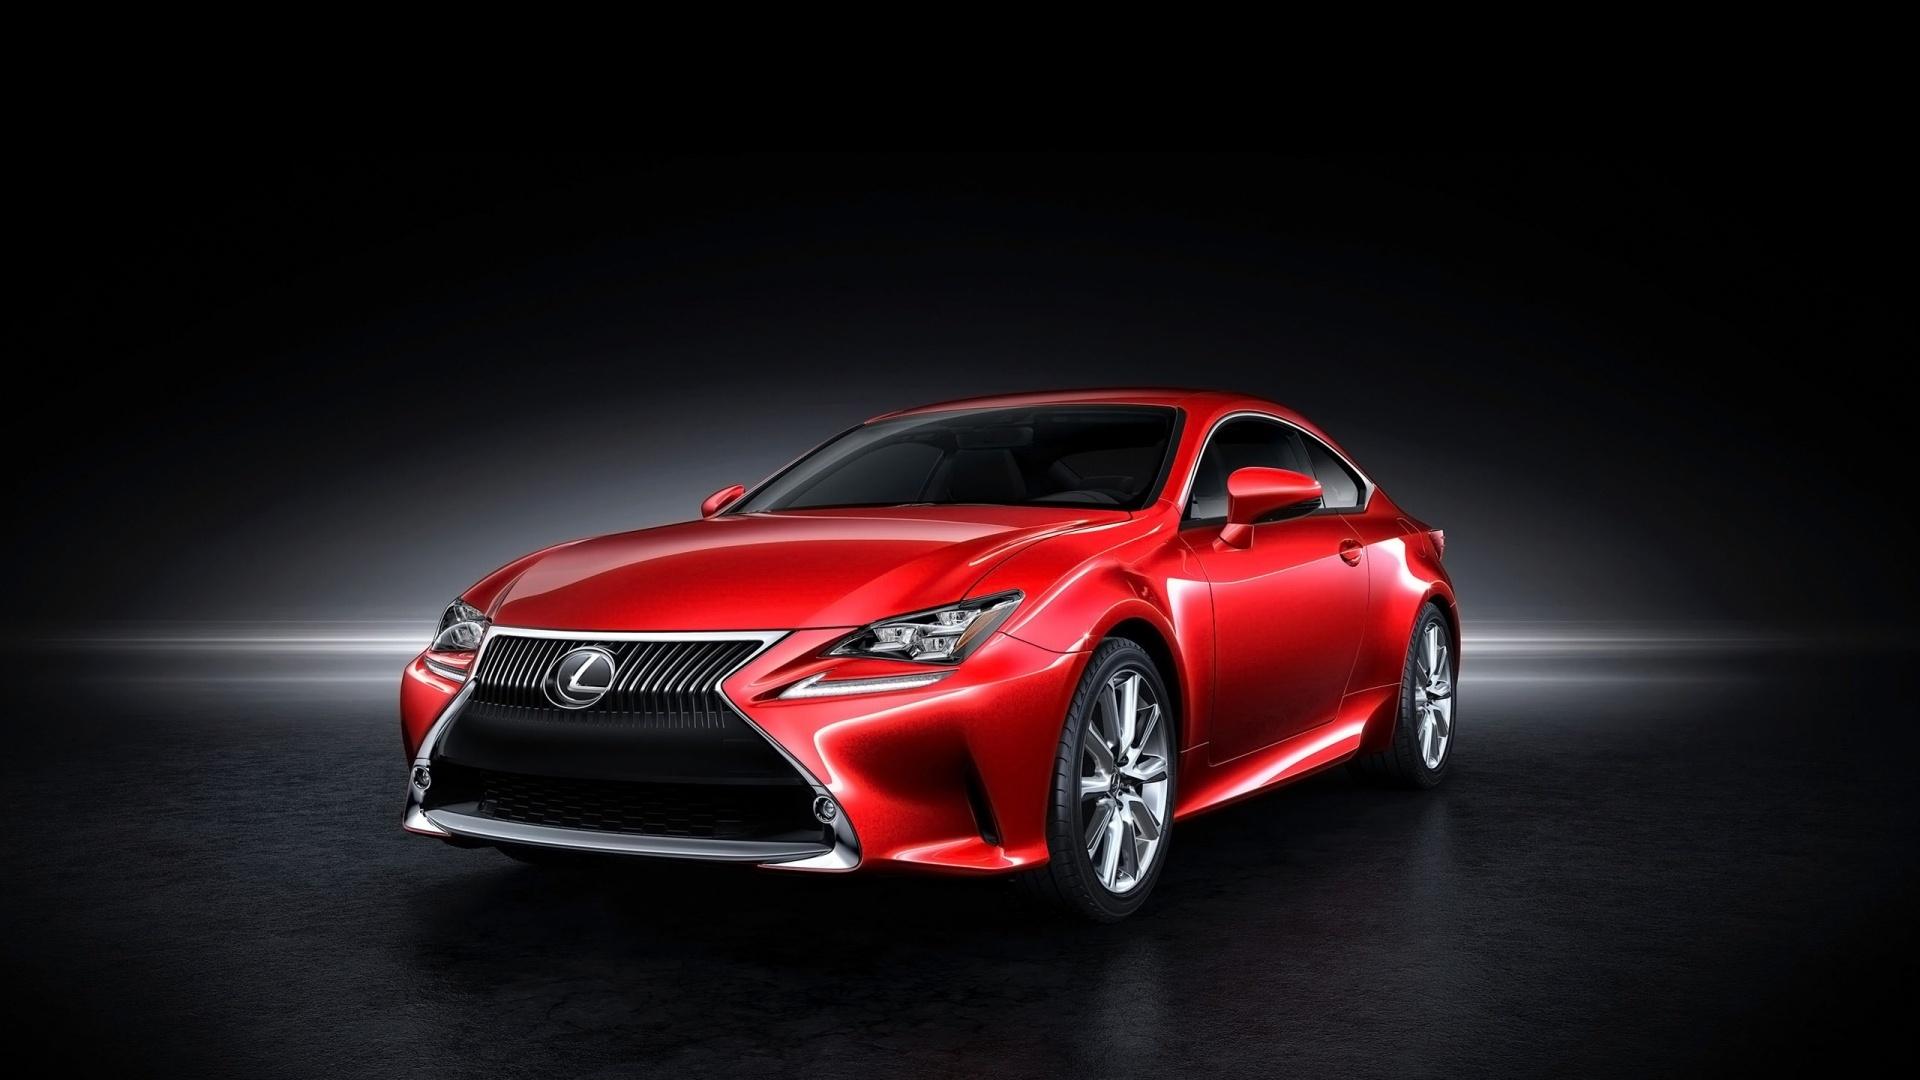 Lexus free image